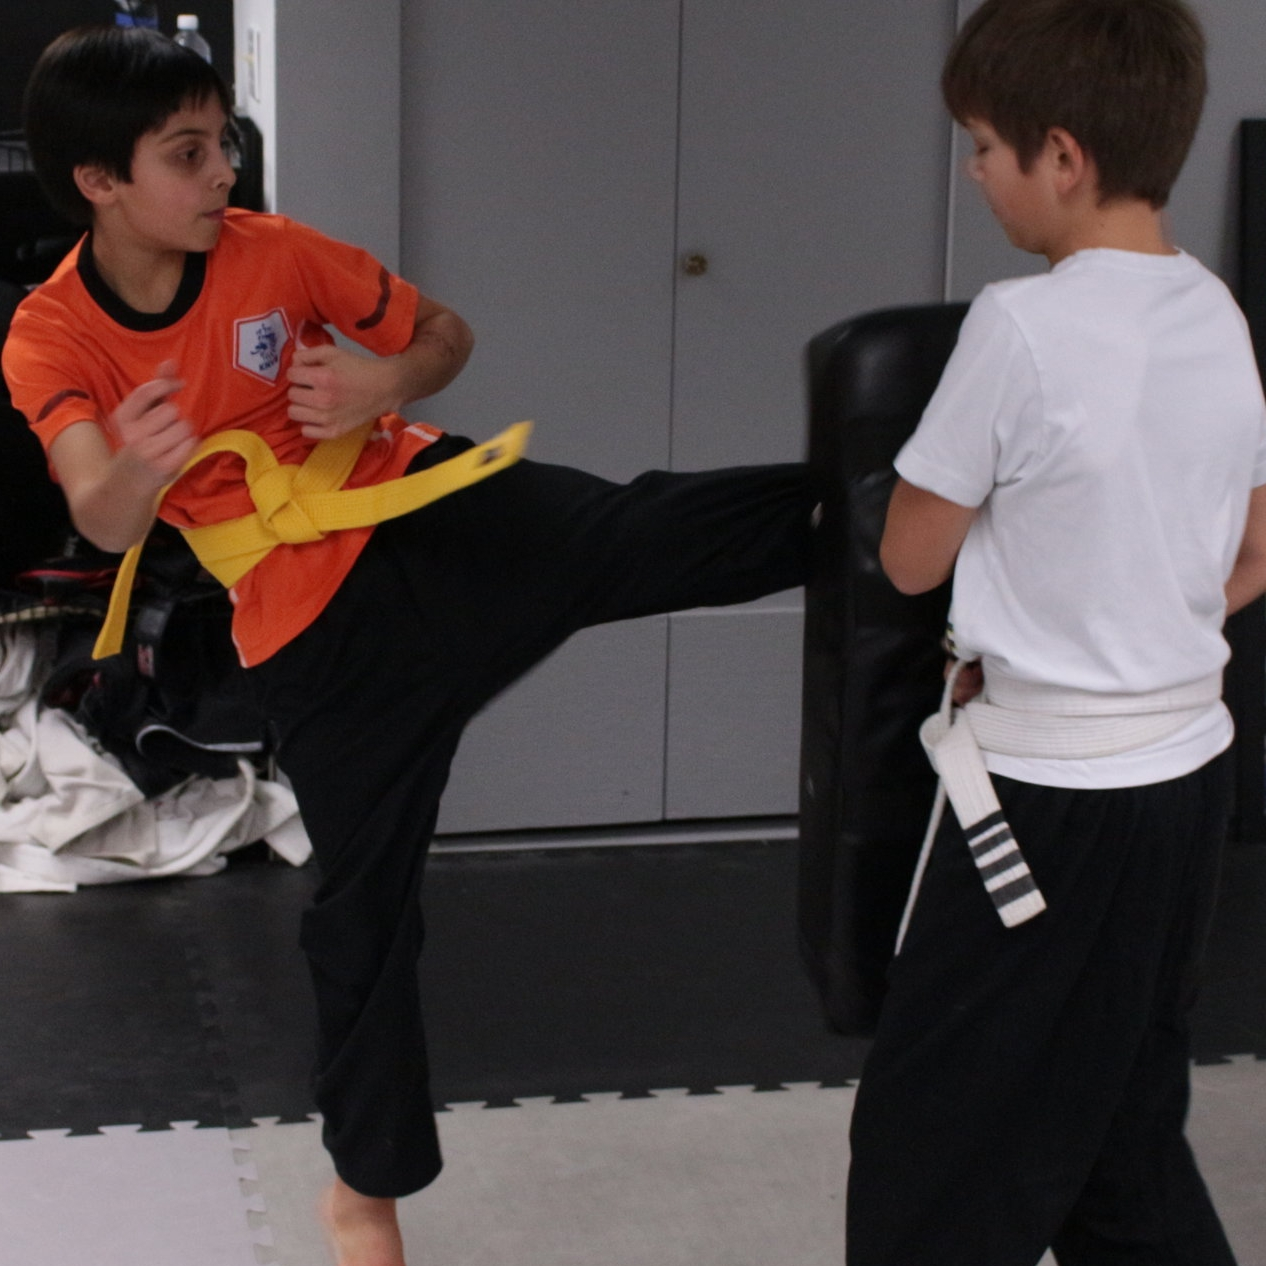 Kids Kickboxing - Kickboxing for kids 6-12 years old.